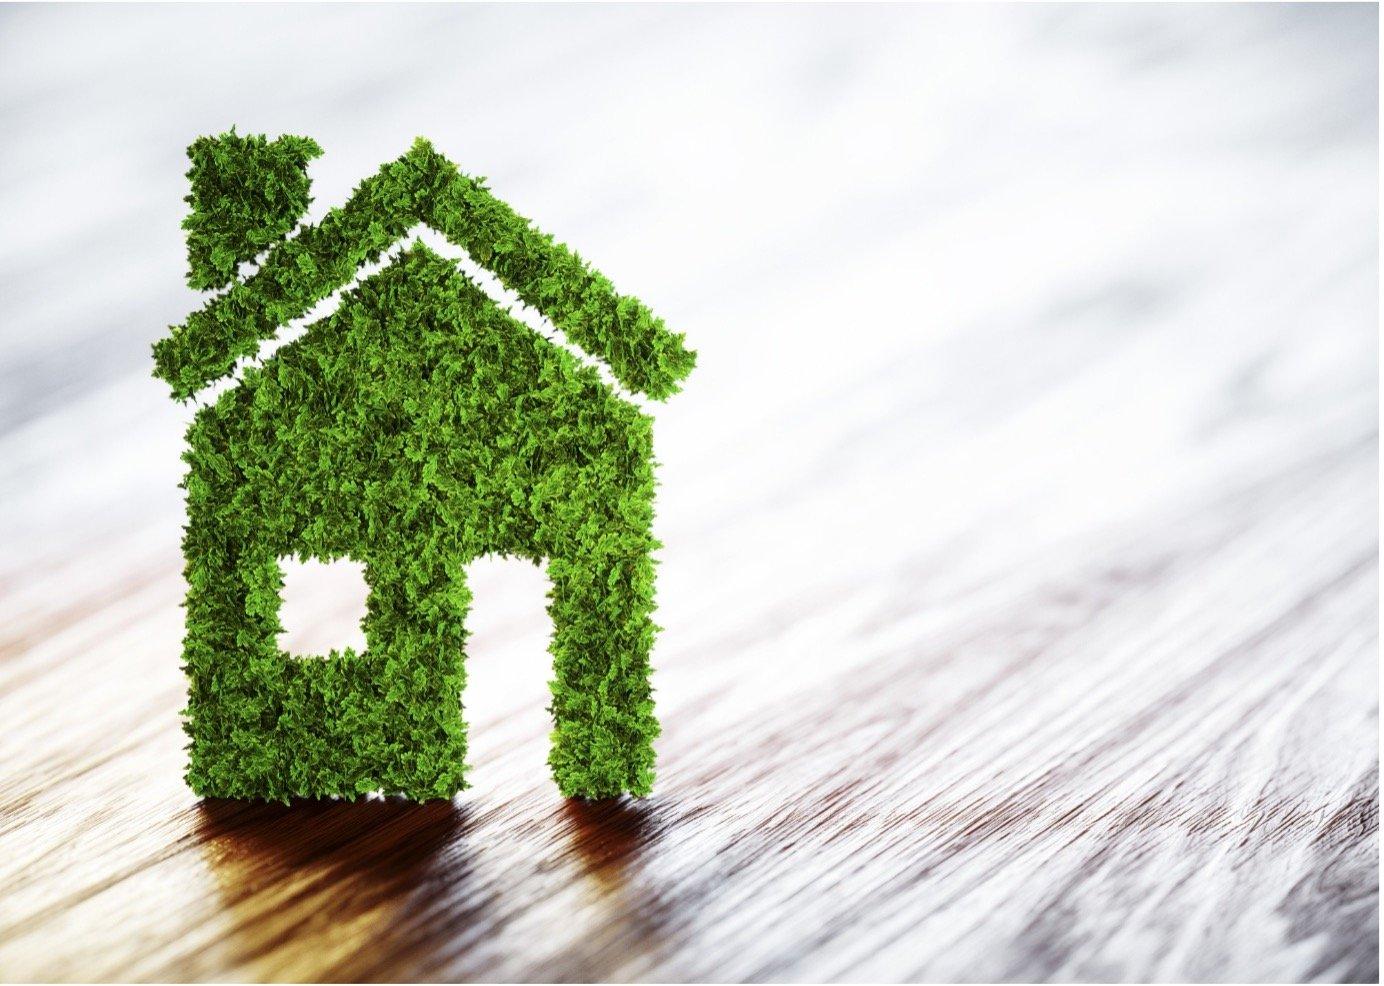 Environmentally-Friendly Homes